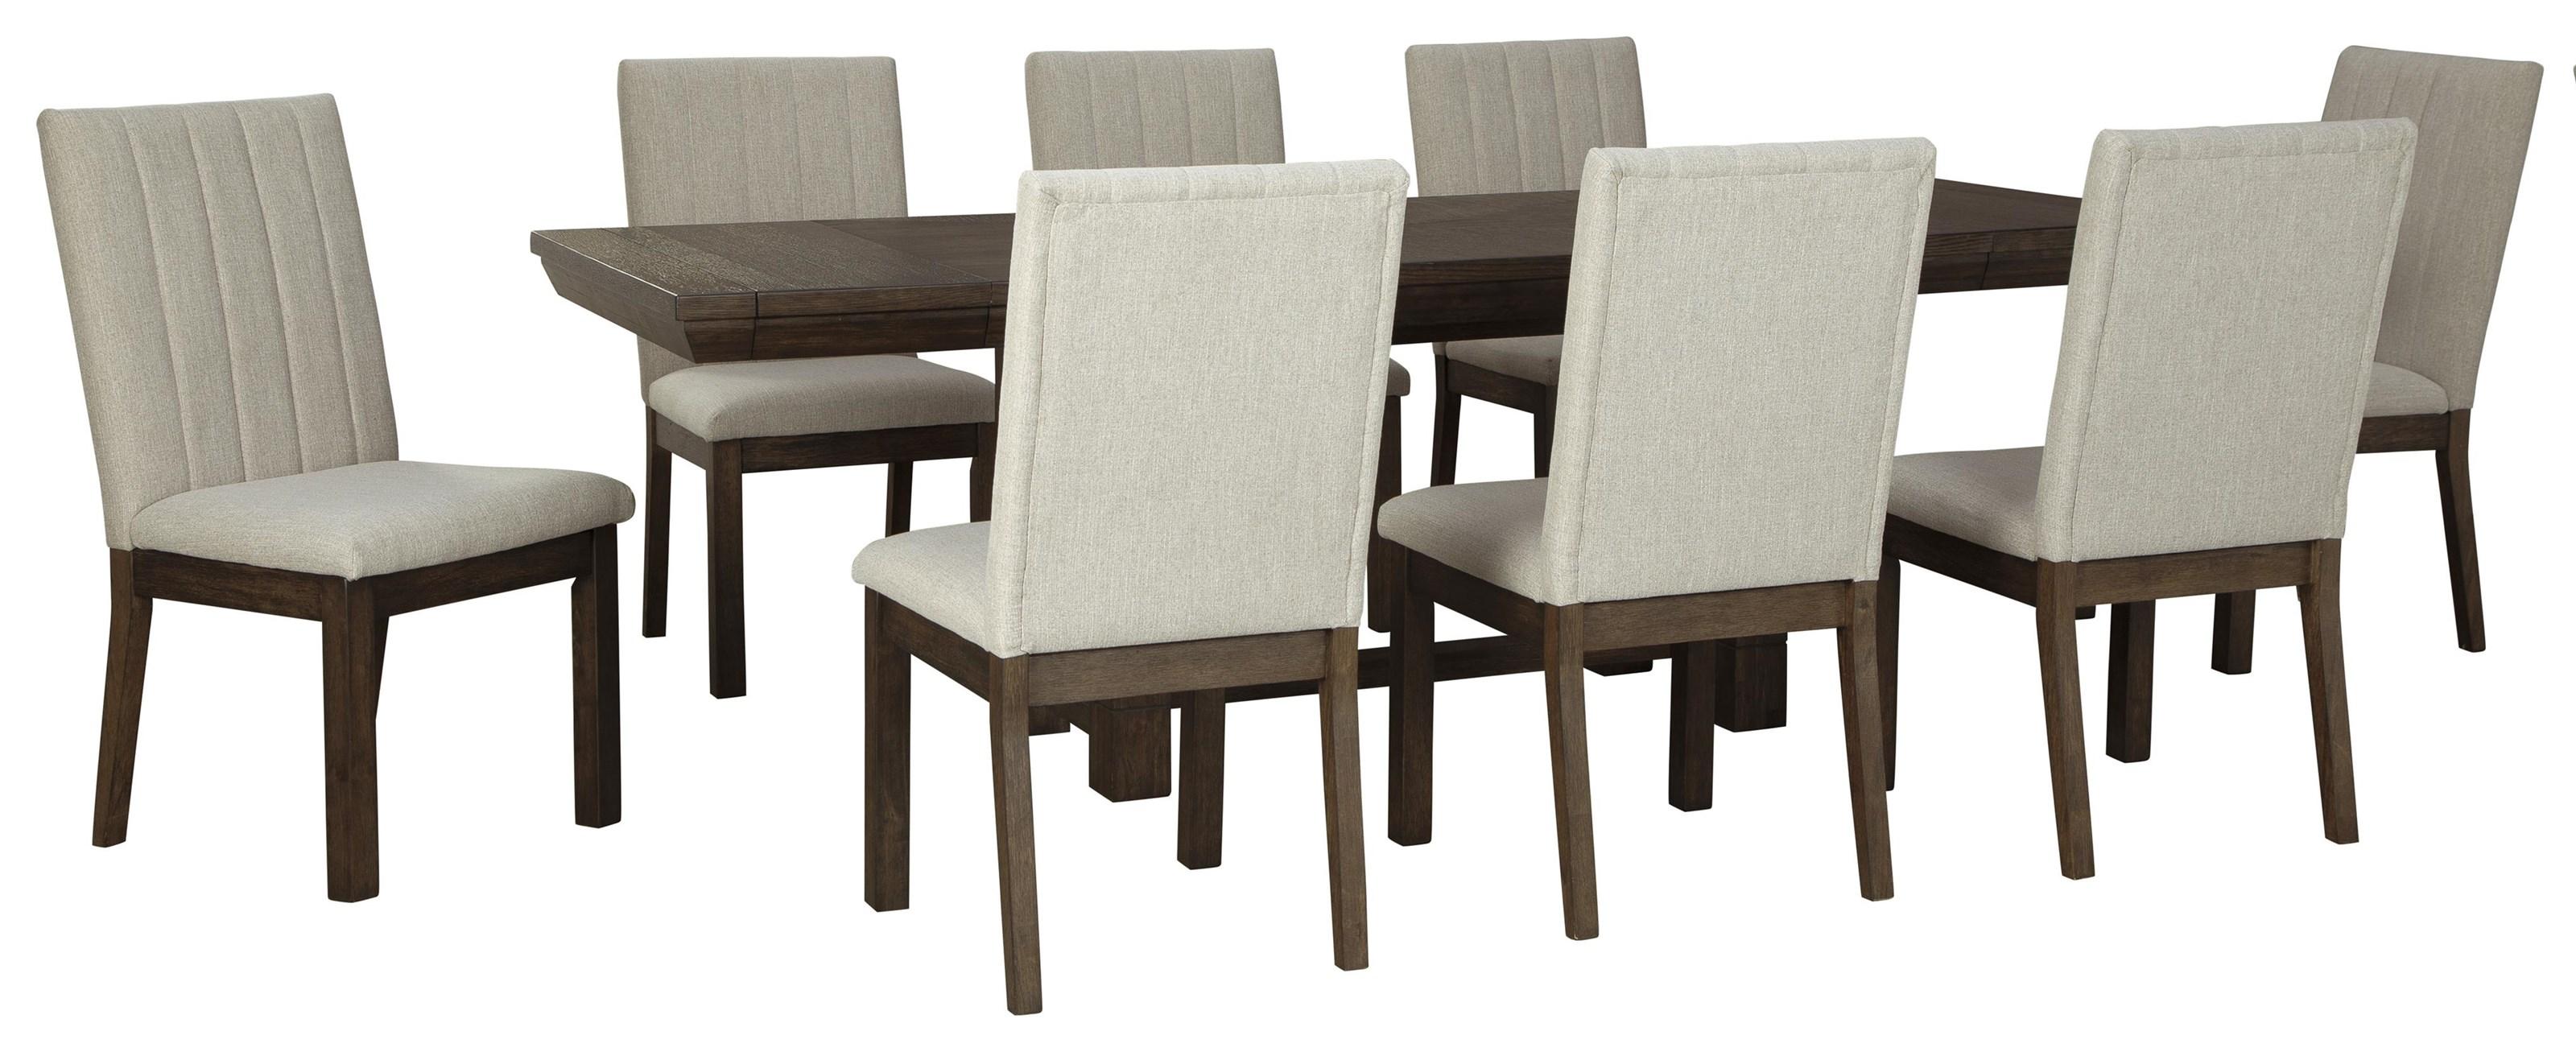 Dellbeck 9 PC Dining Room Set by Ashley Furniture at Sam Levitz Furniture